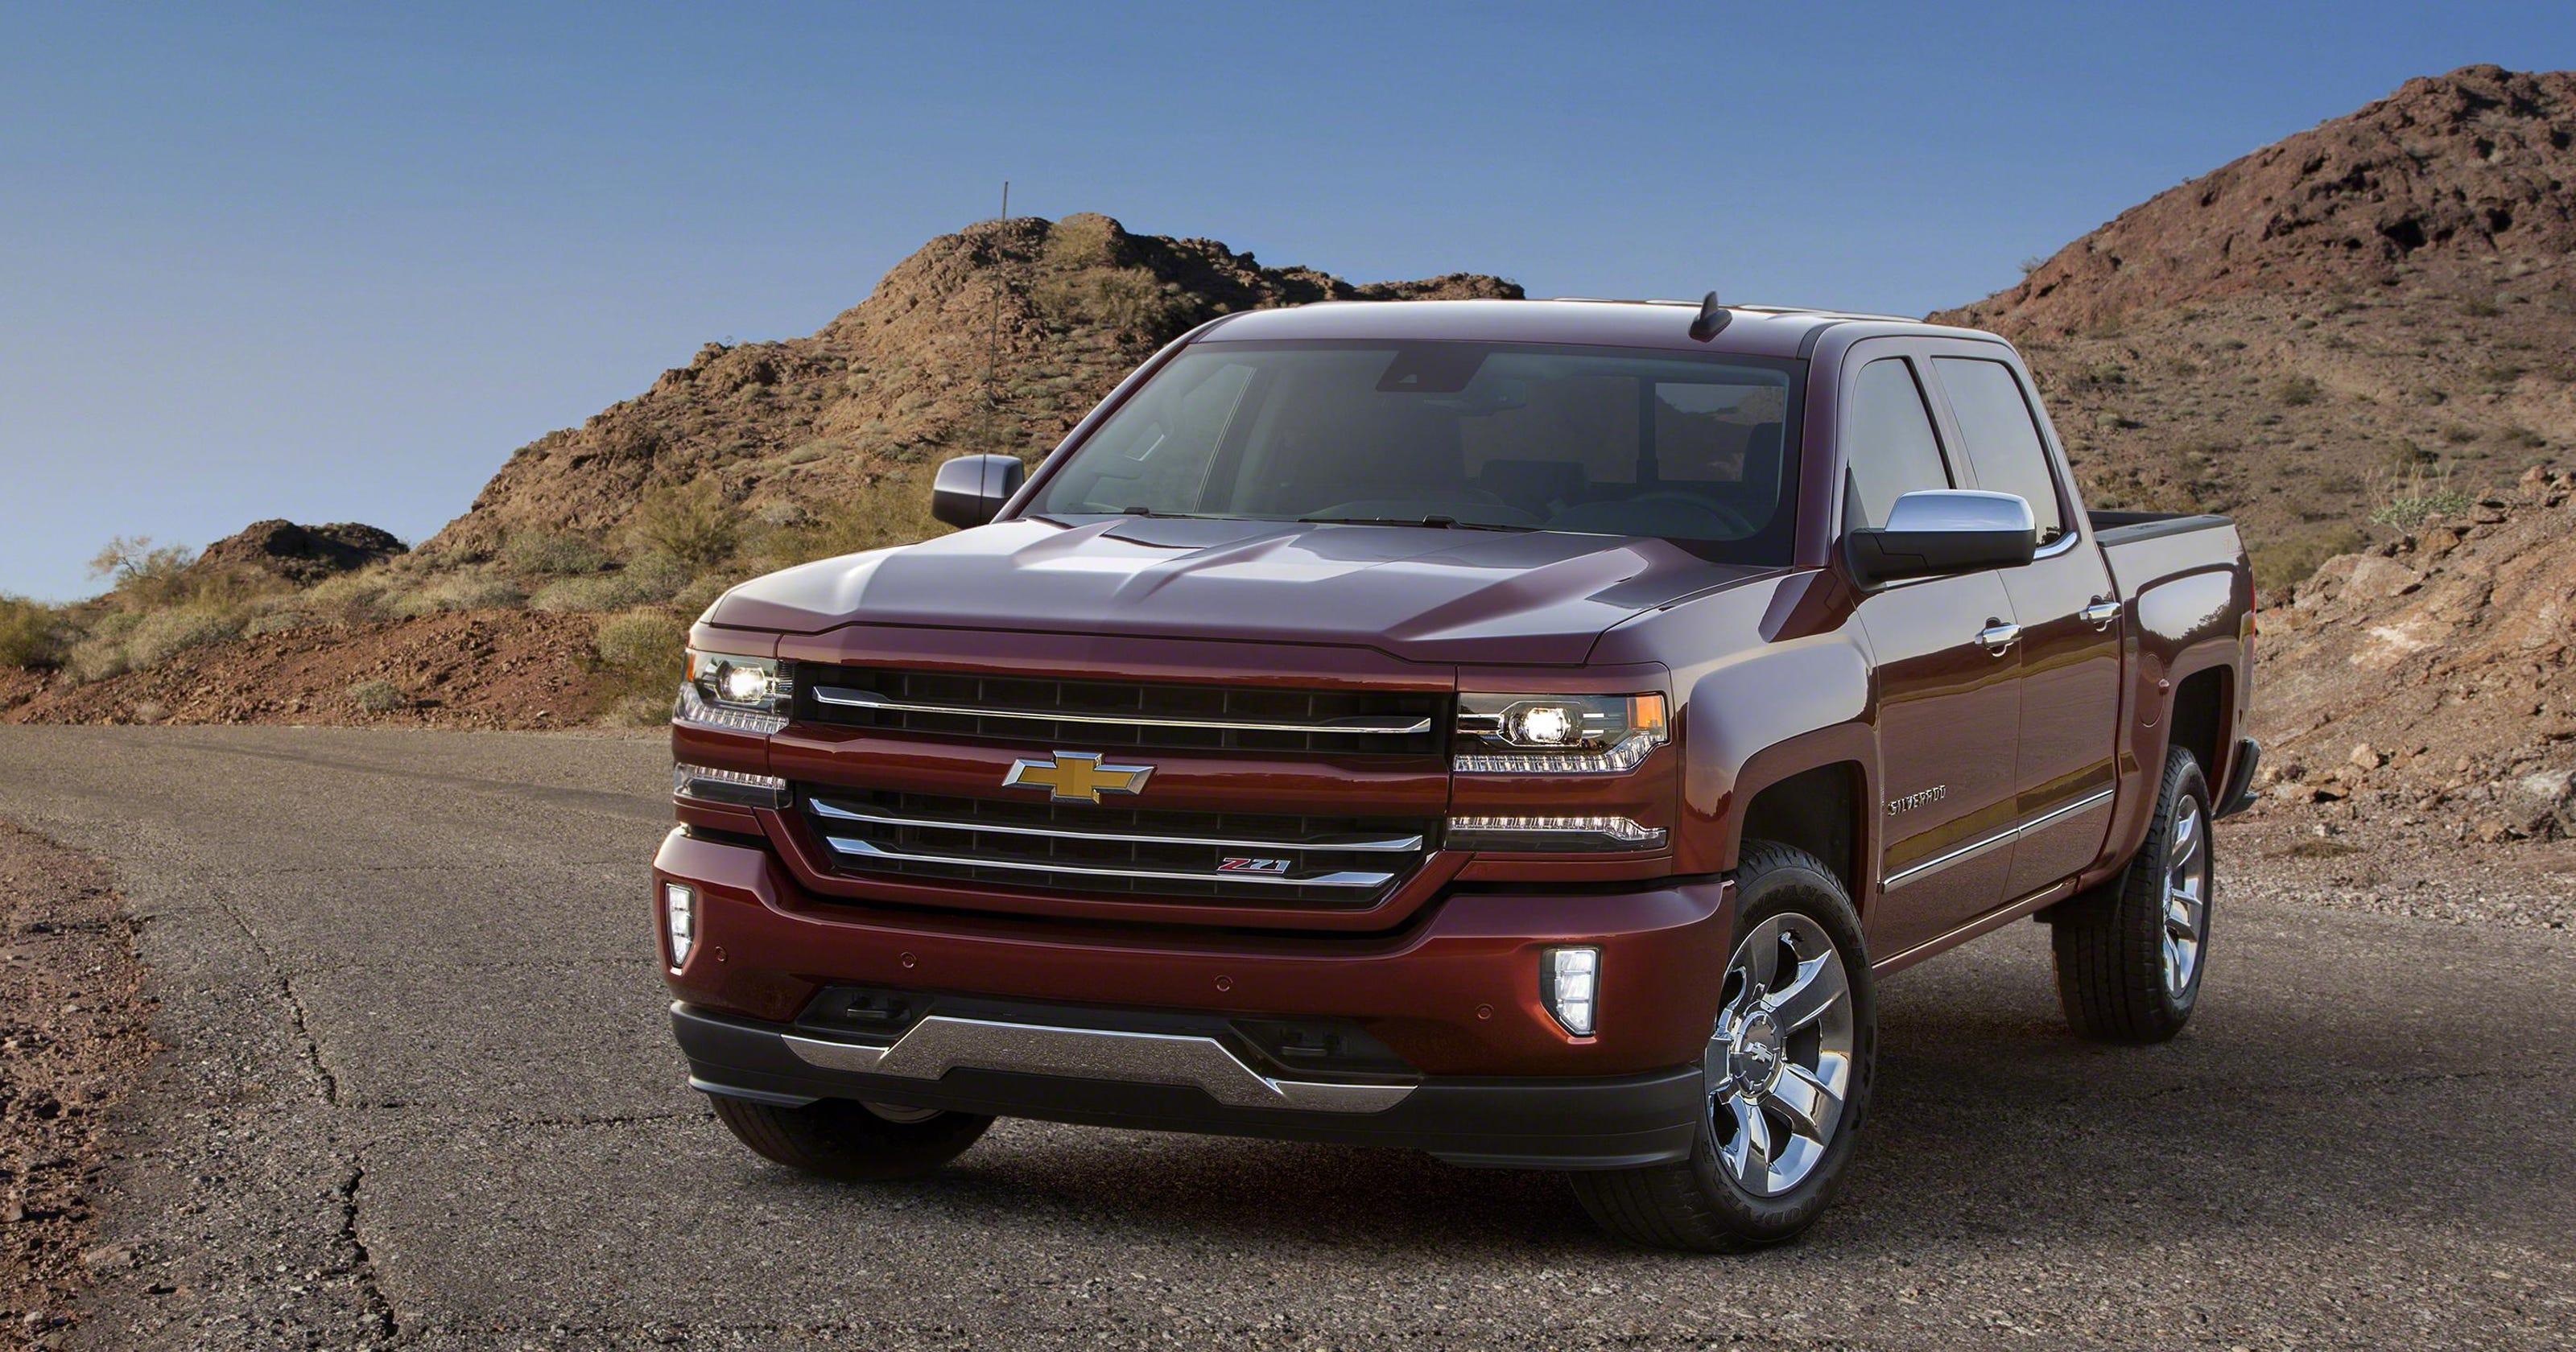 Build A Chevy Truck >> Gm May Build Chevy Silverado At Oshawa Plant